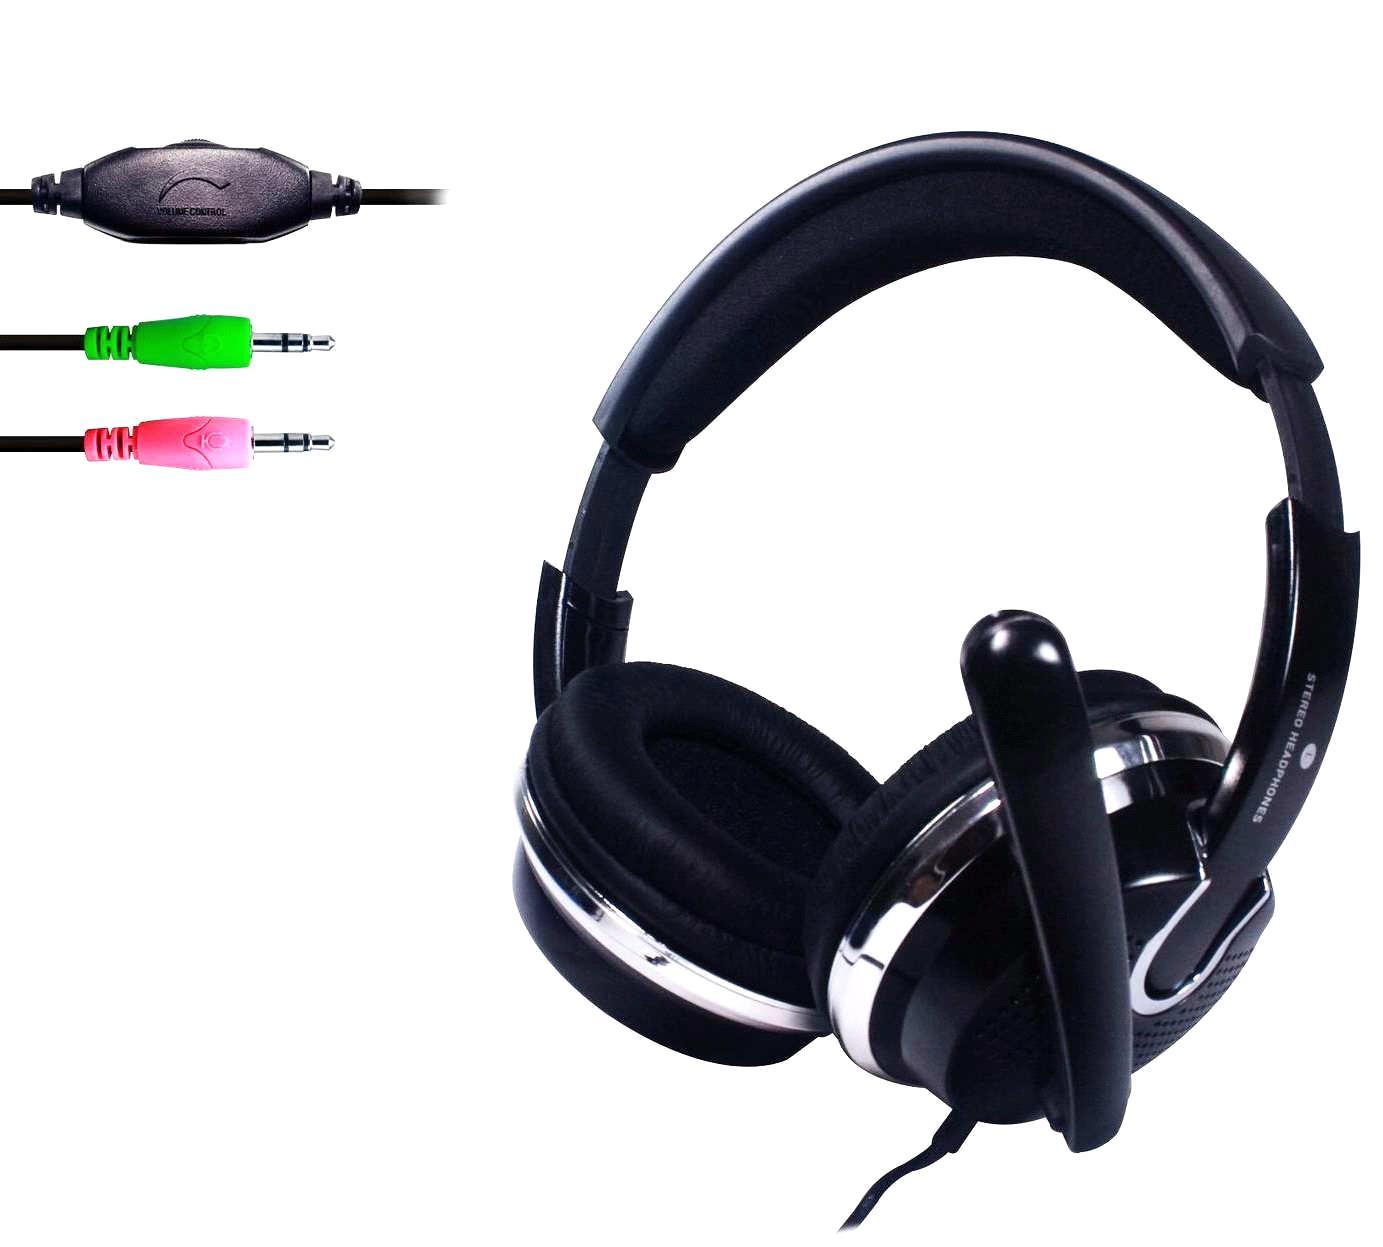 headset for pc mhp 802   china headset for pc mhp 802  headset